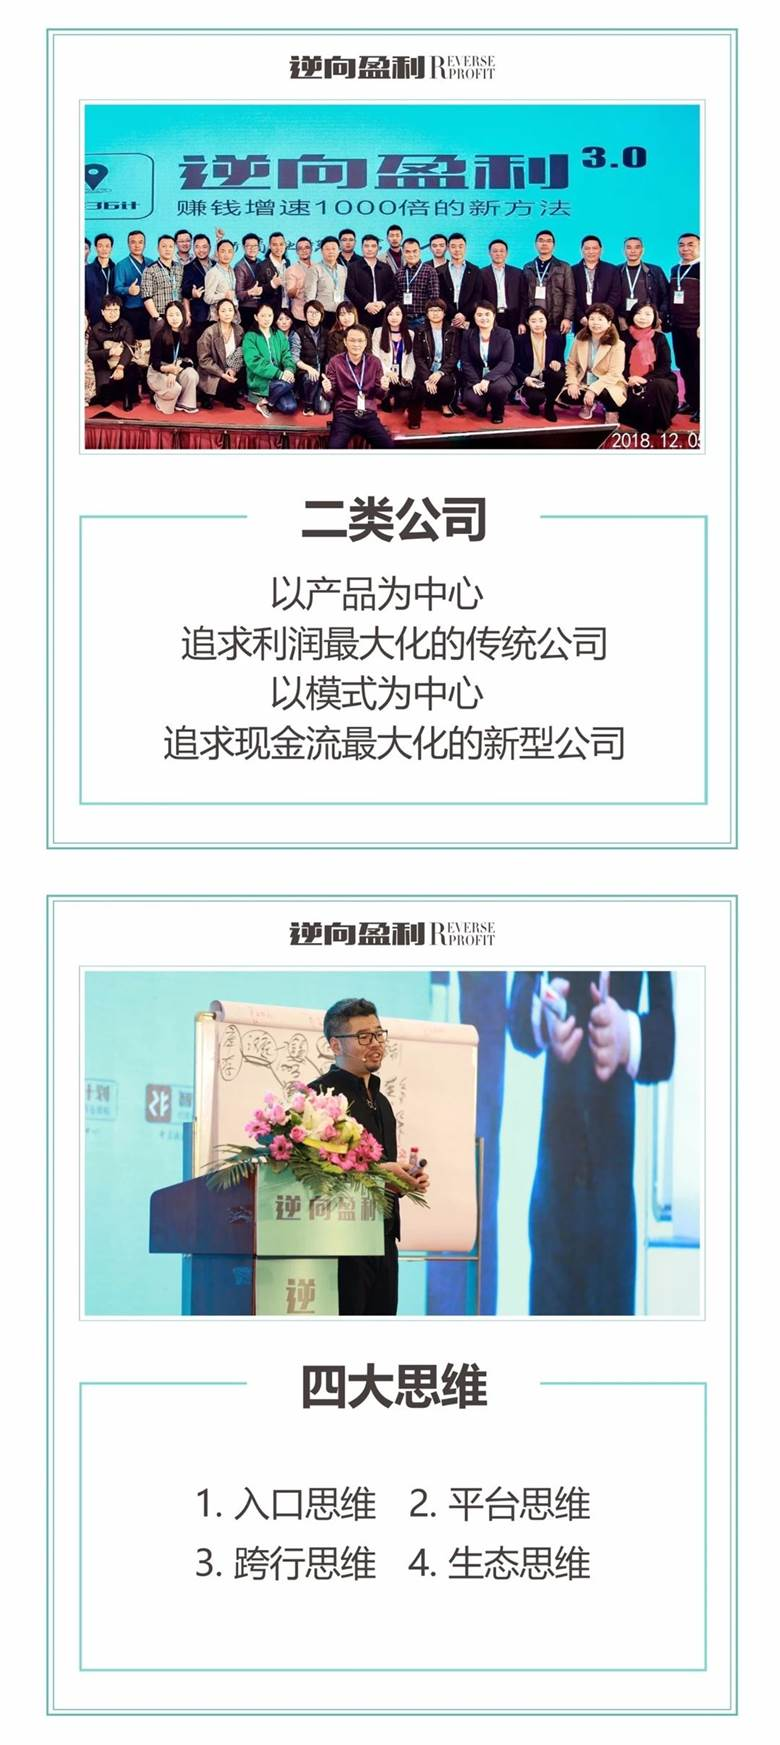 http://www.huodongxing.com/file/20191113/1063603644976/953659459473200.jpg